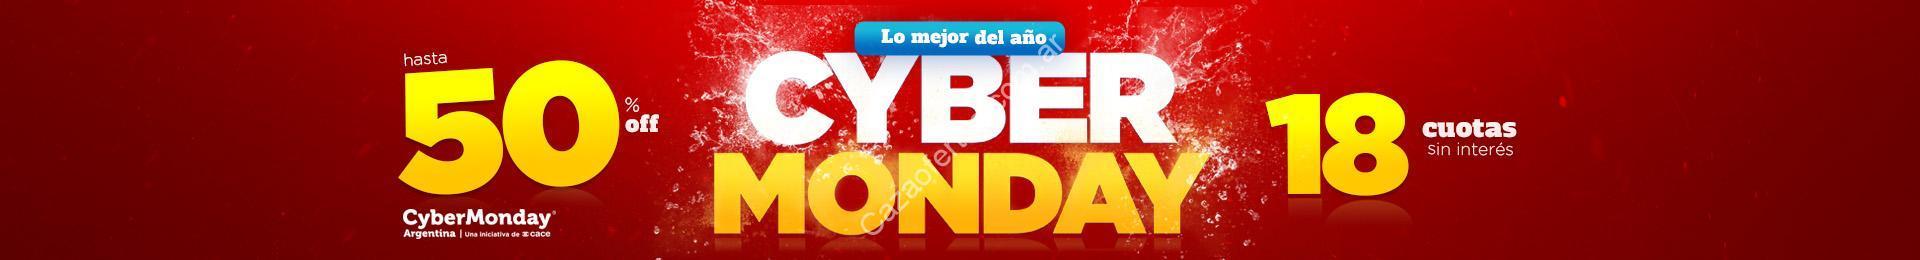 Ofertas garbarino cyber monday 2016 maiameee descuentos Cyber monday 2016 argentina muebles